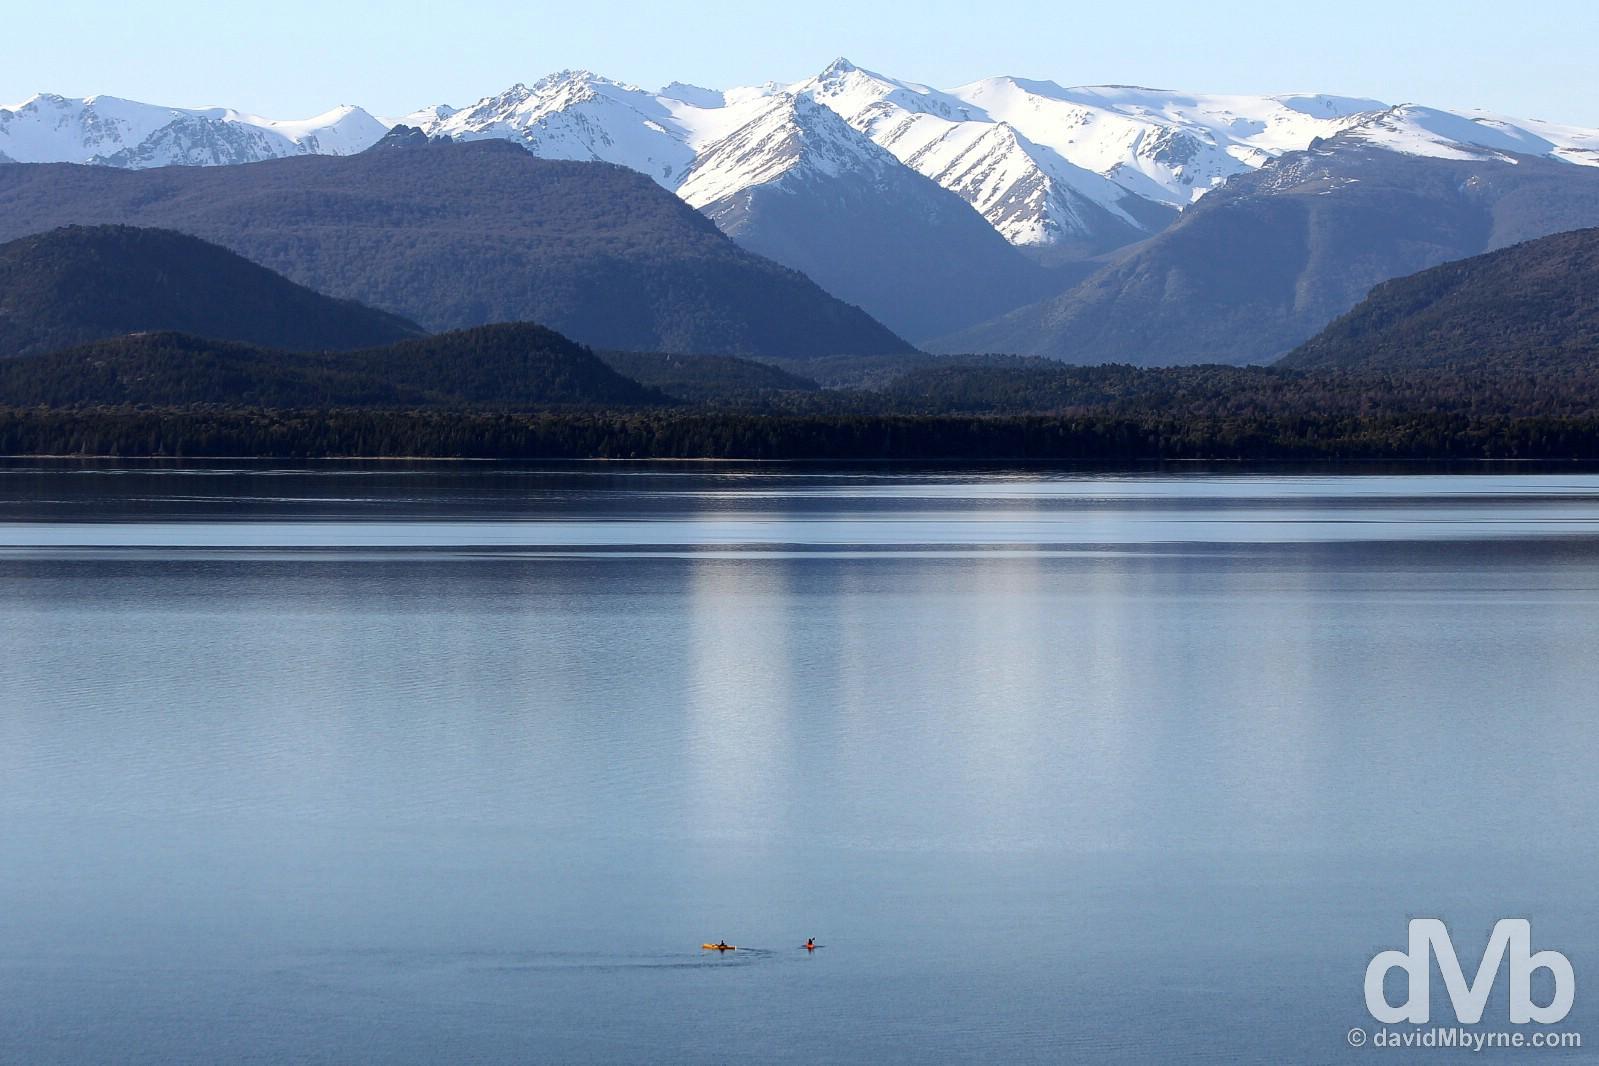 Kayaking on Lago Nahuel Huapi as seen from Bariloche, Patagonia, Argentina. October 17, 2015.